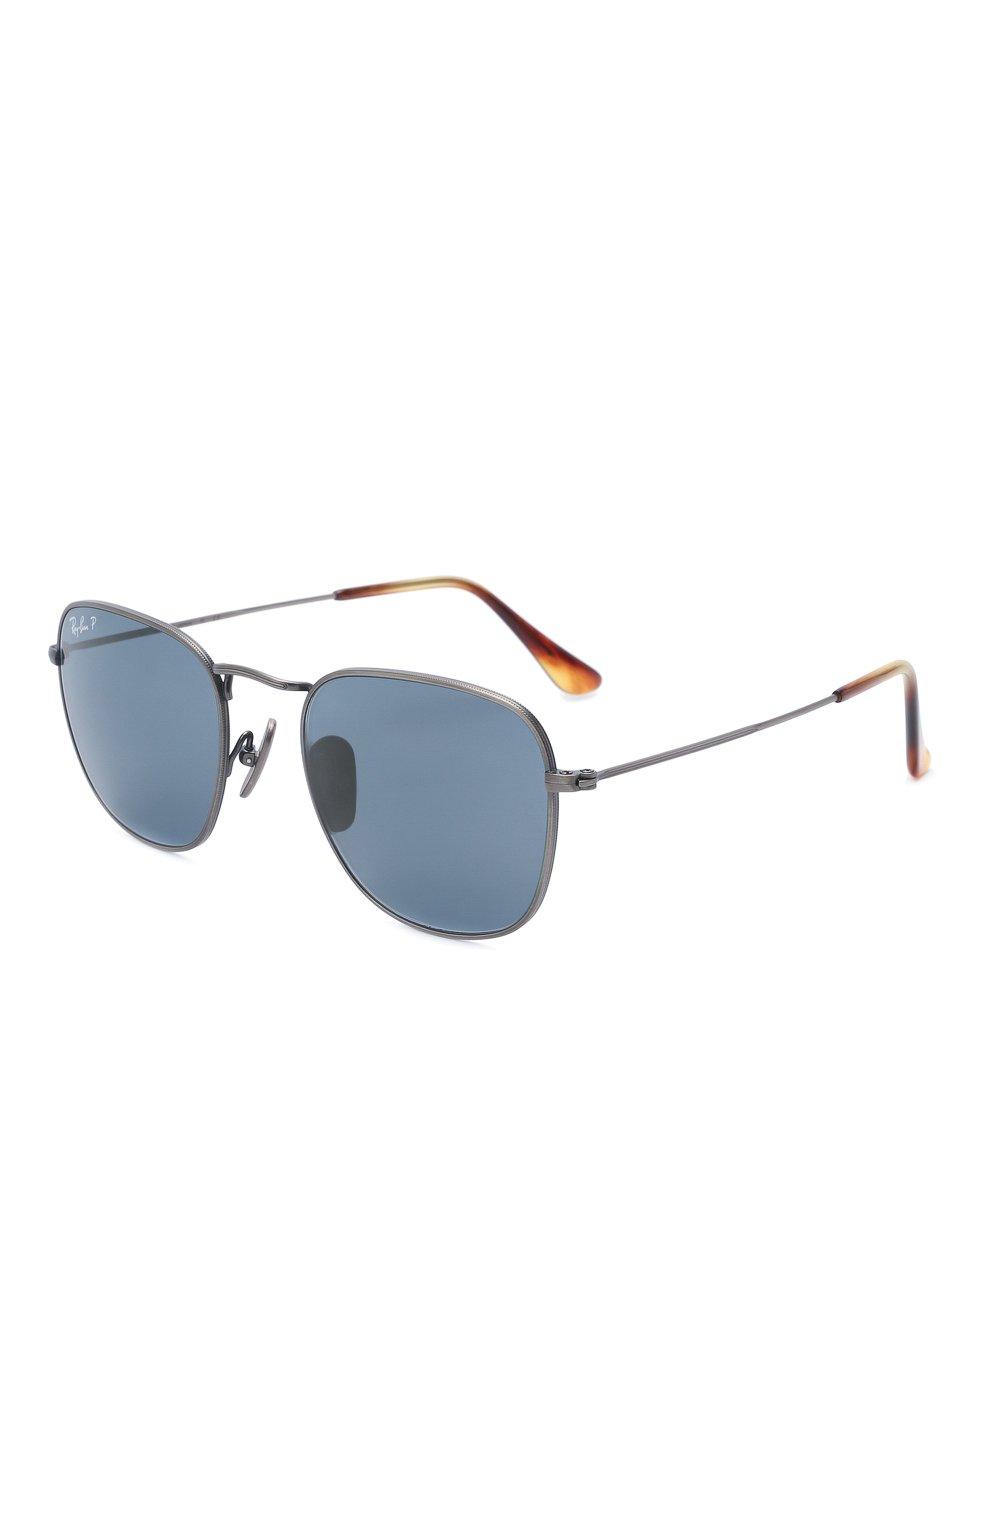 Женские солнцезащитные очки RAY-BAN темно-синего цвета, арт. 8157-9208T0 | Фото 1